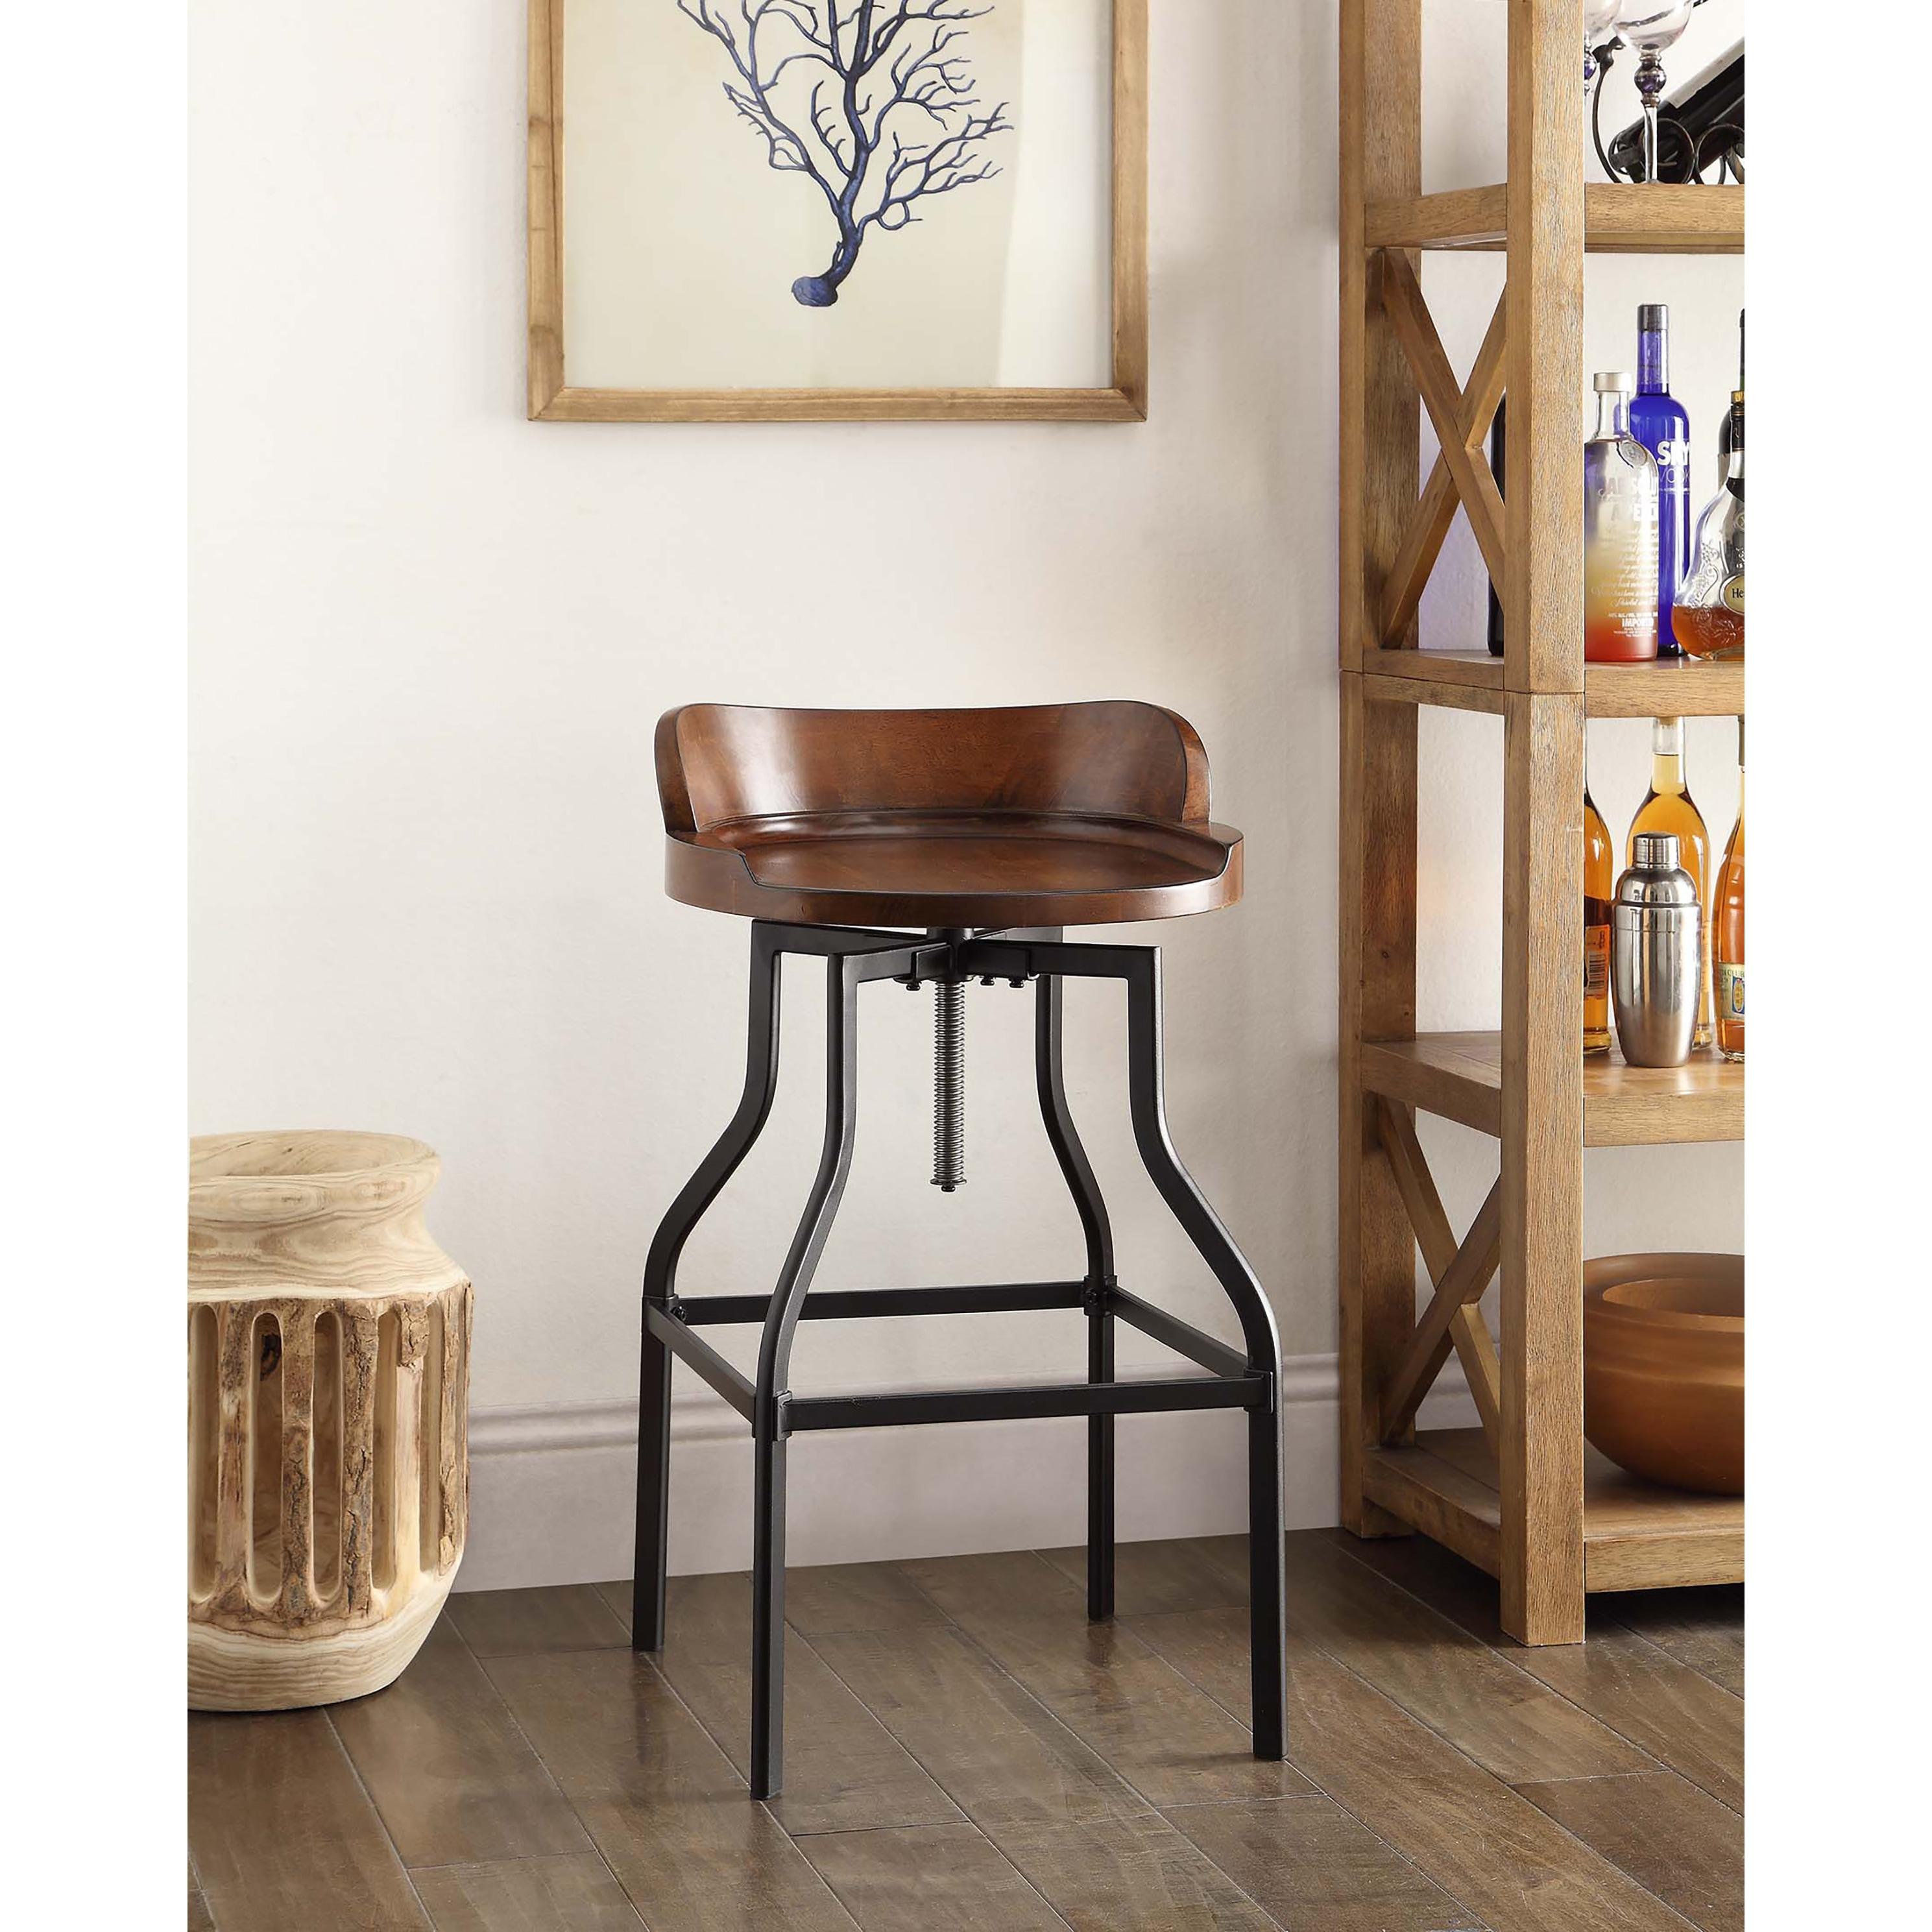 Silicone Feet For Furniture Furniture Designs